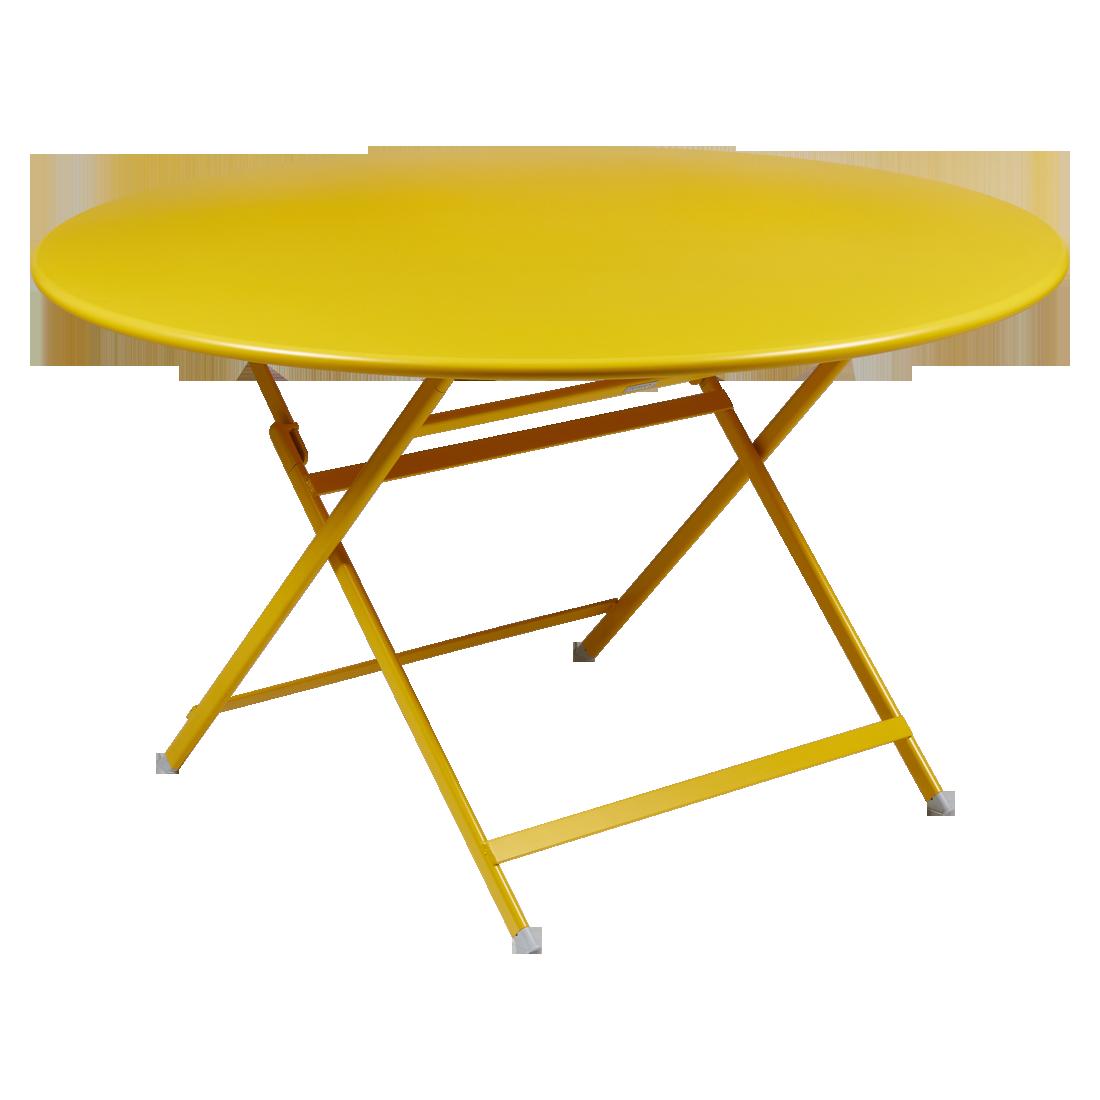 table de jardin pliante, table metal ronde, table metal 7 personnes, table de jardin jaune, table metal jaune